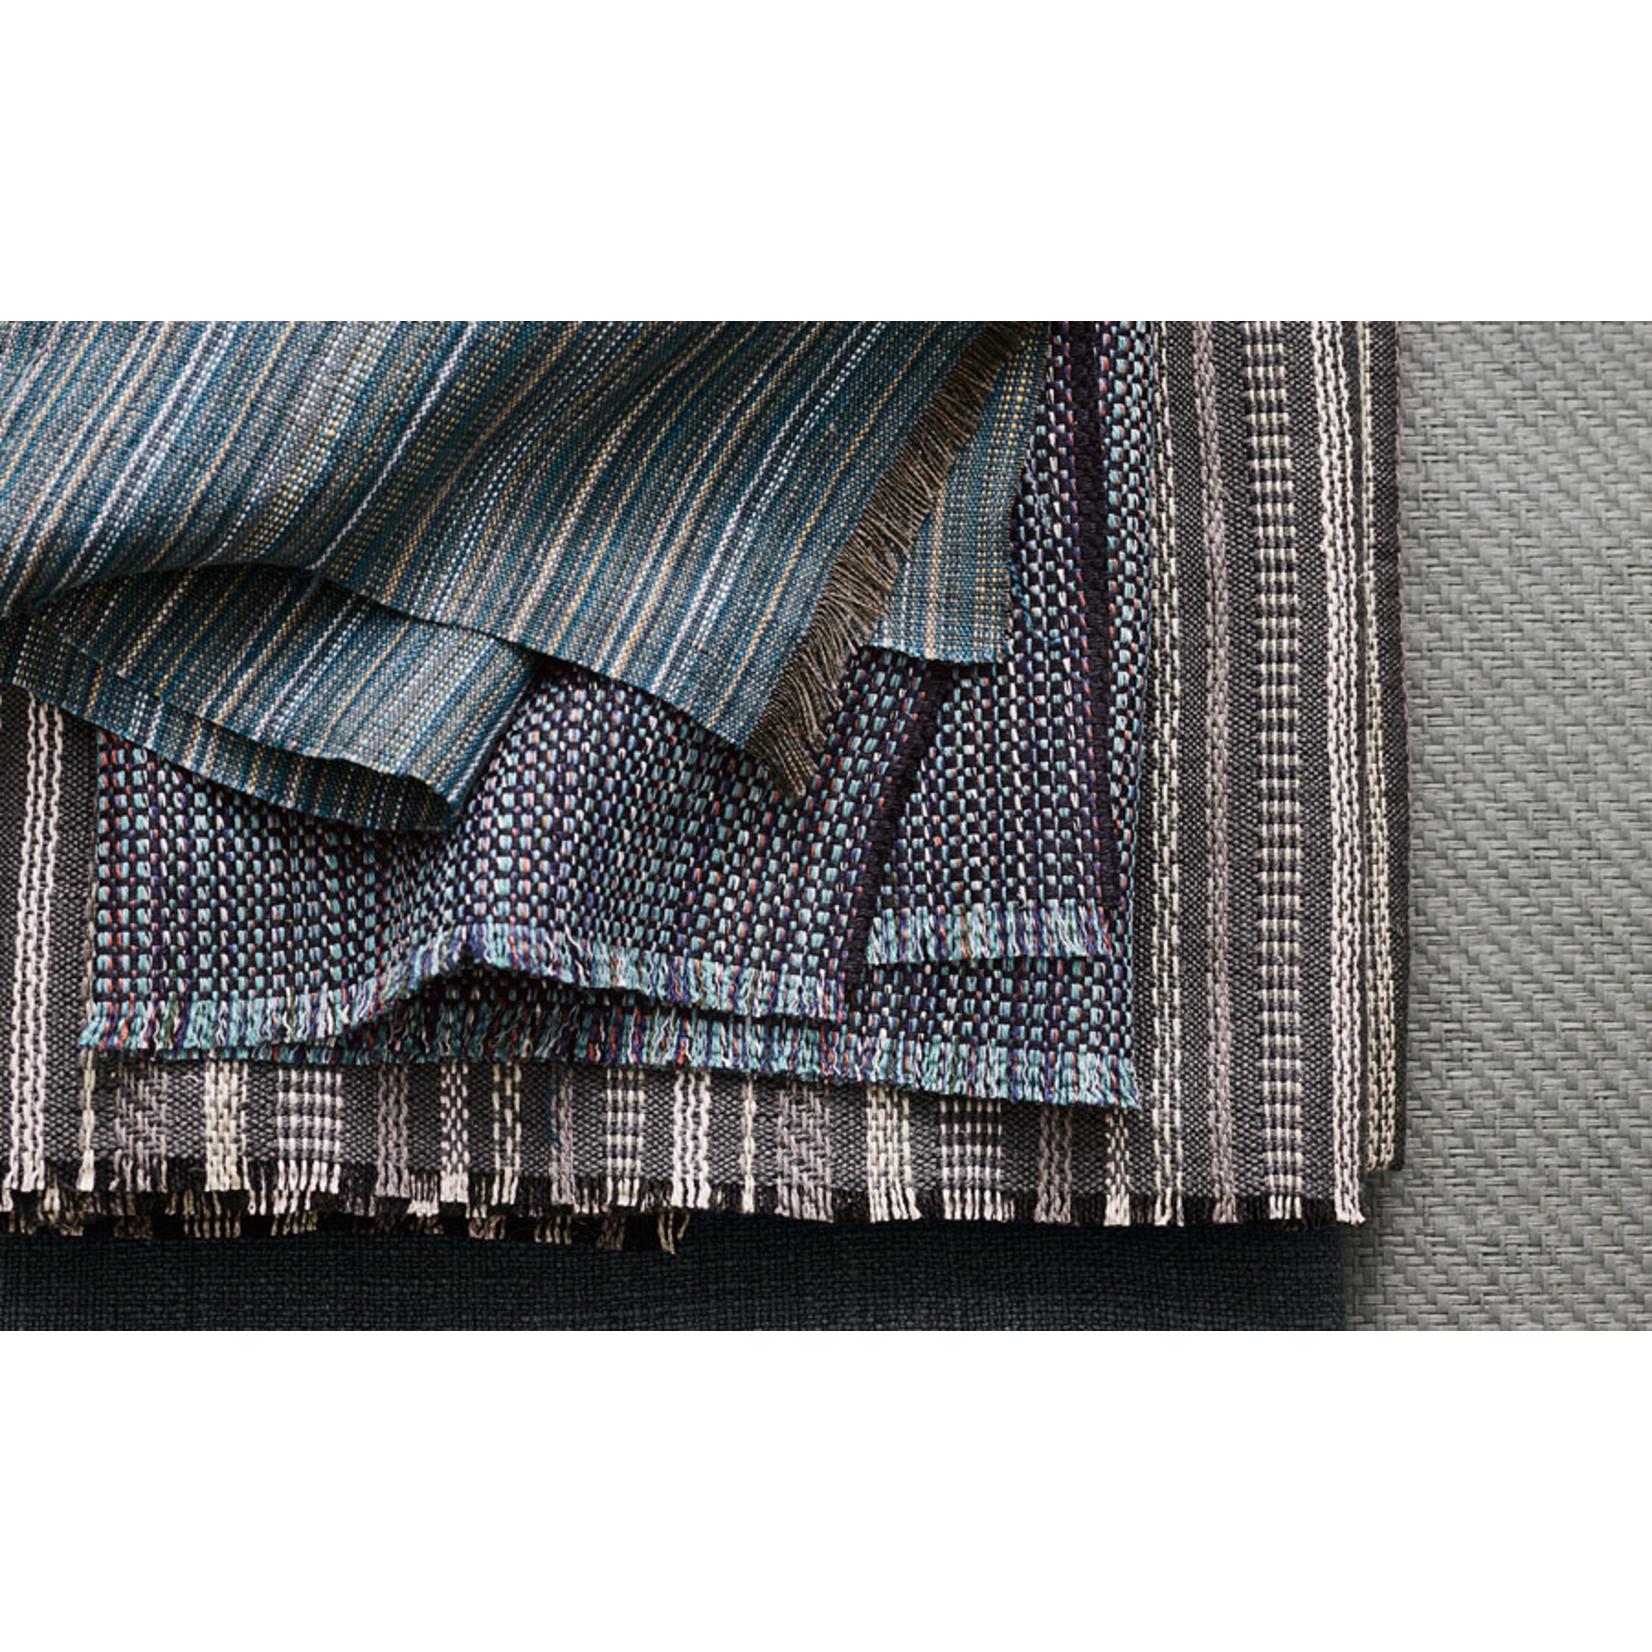 Mark Alexander Paperweave Handwoven Wallcoverings | Papier Lake